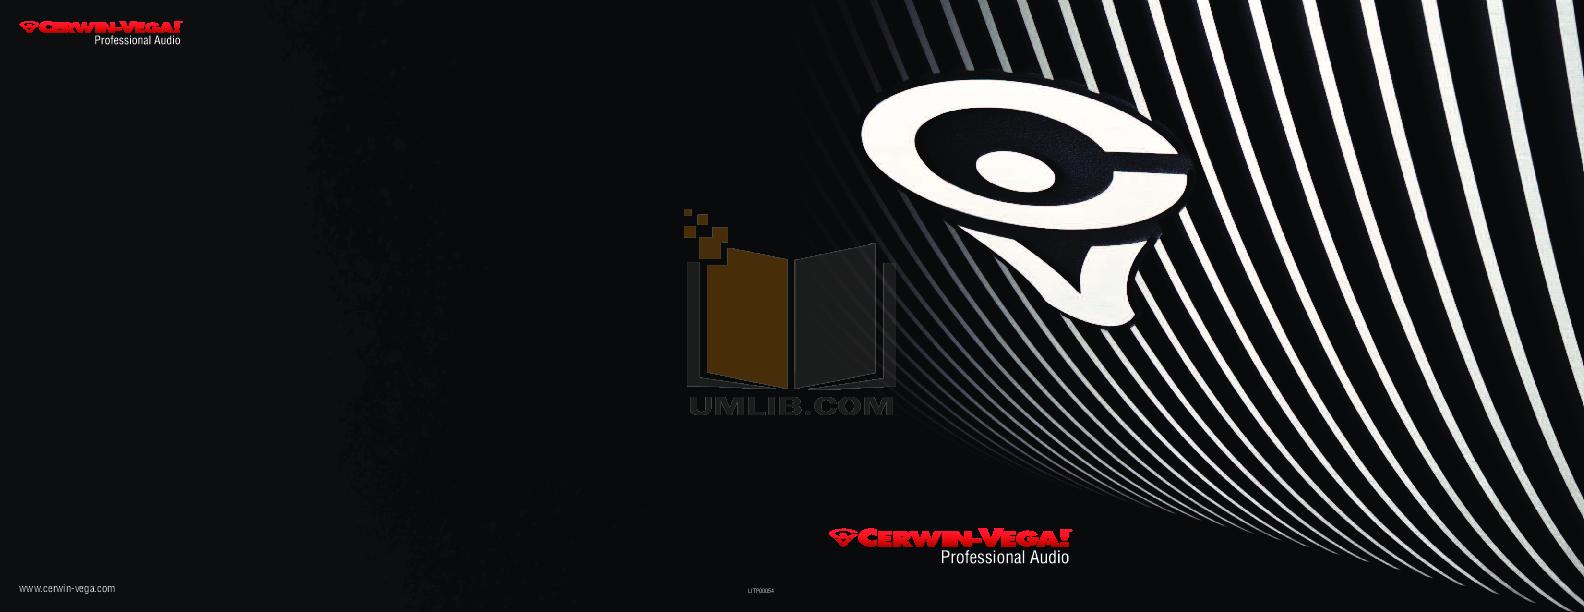 pdf for Cerwin-Vega Subwoofer CVA-121 manual